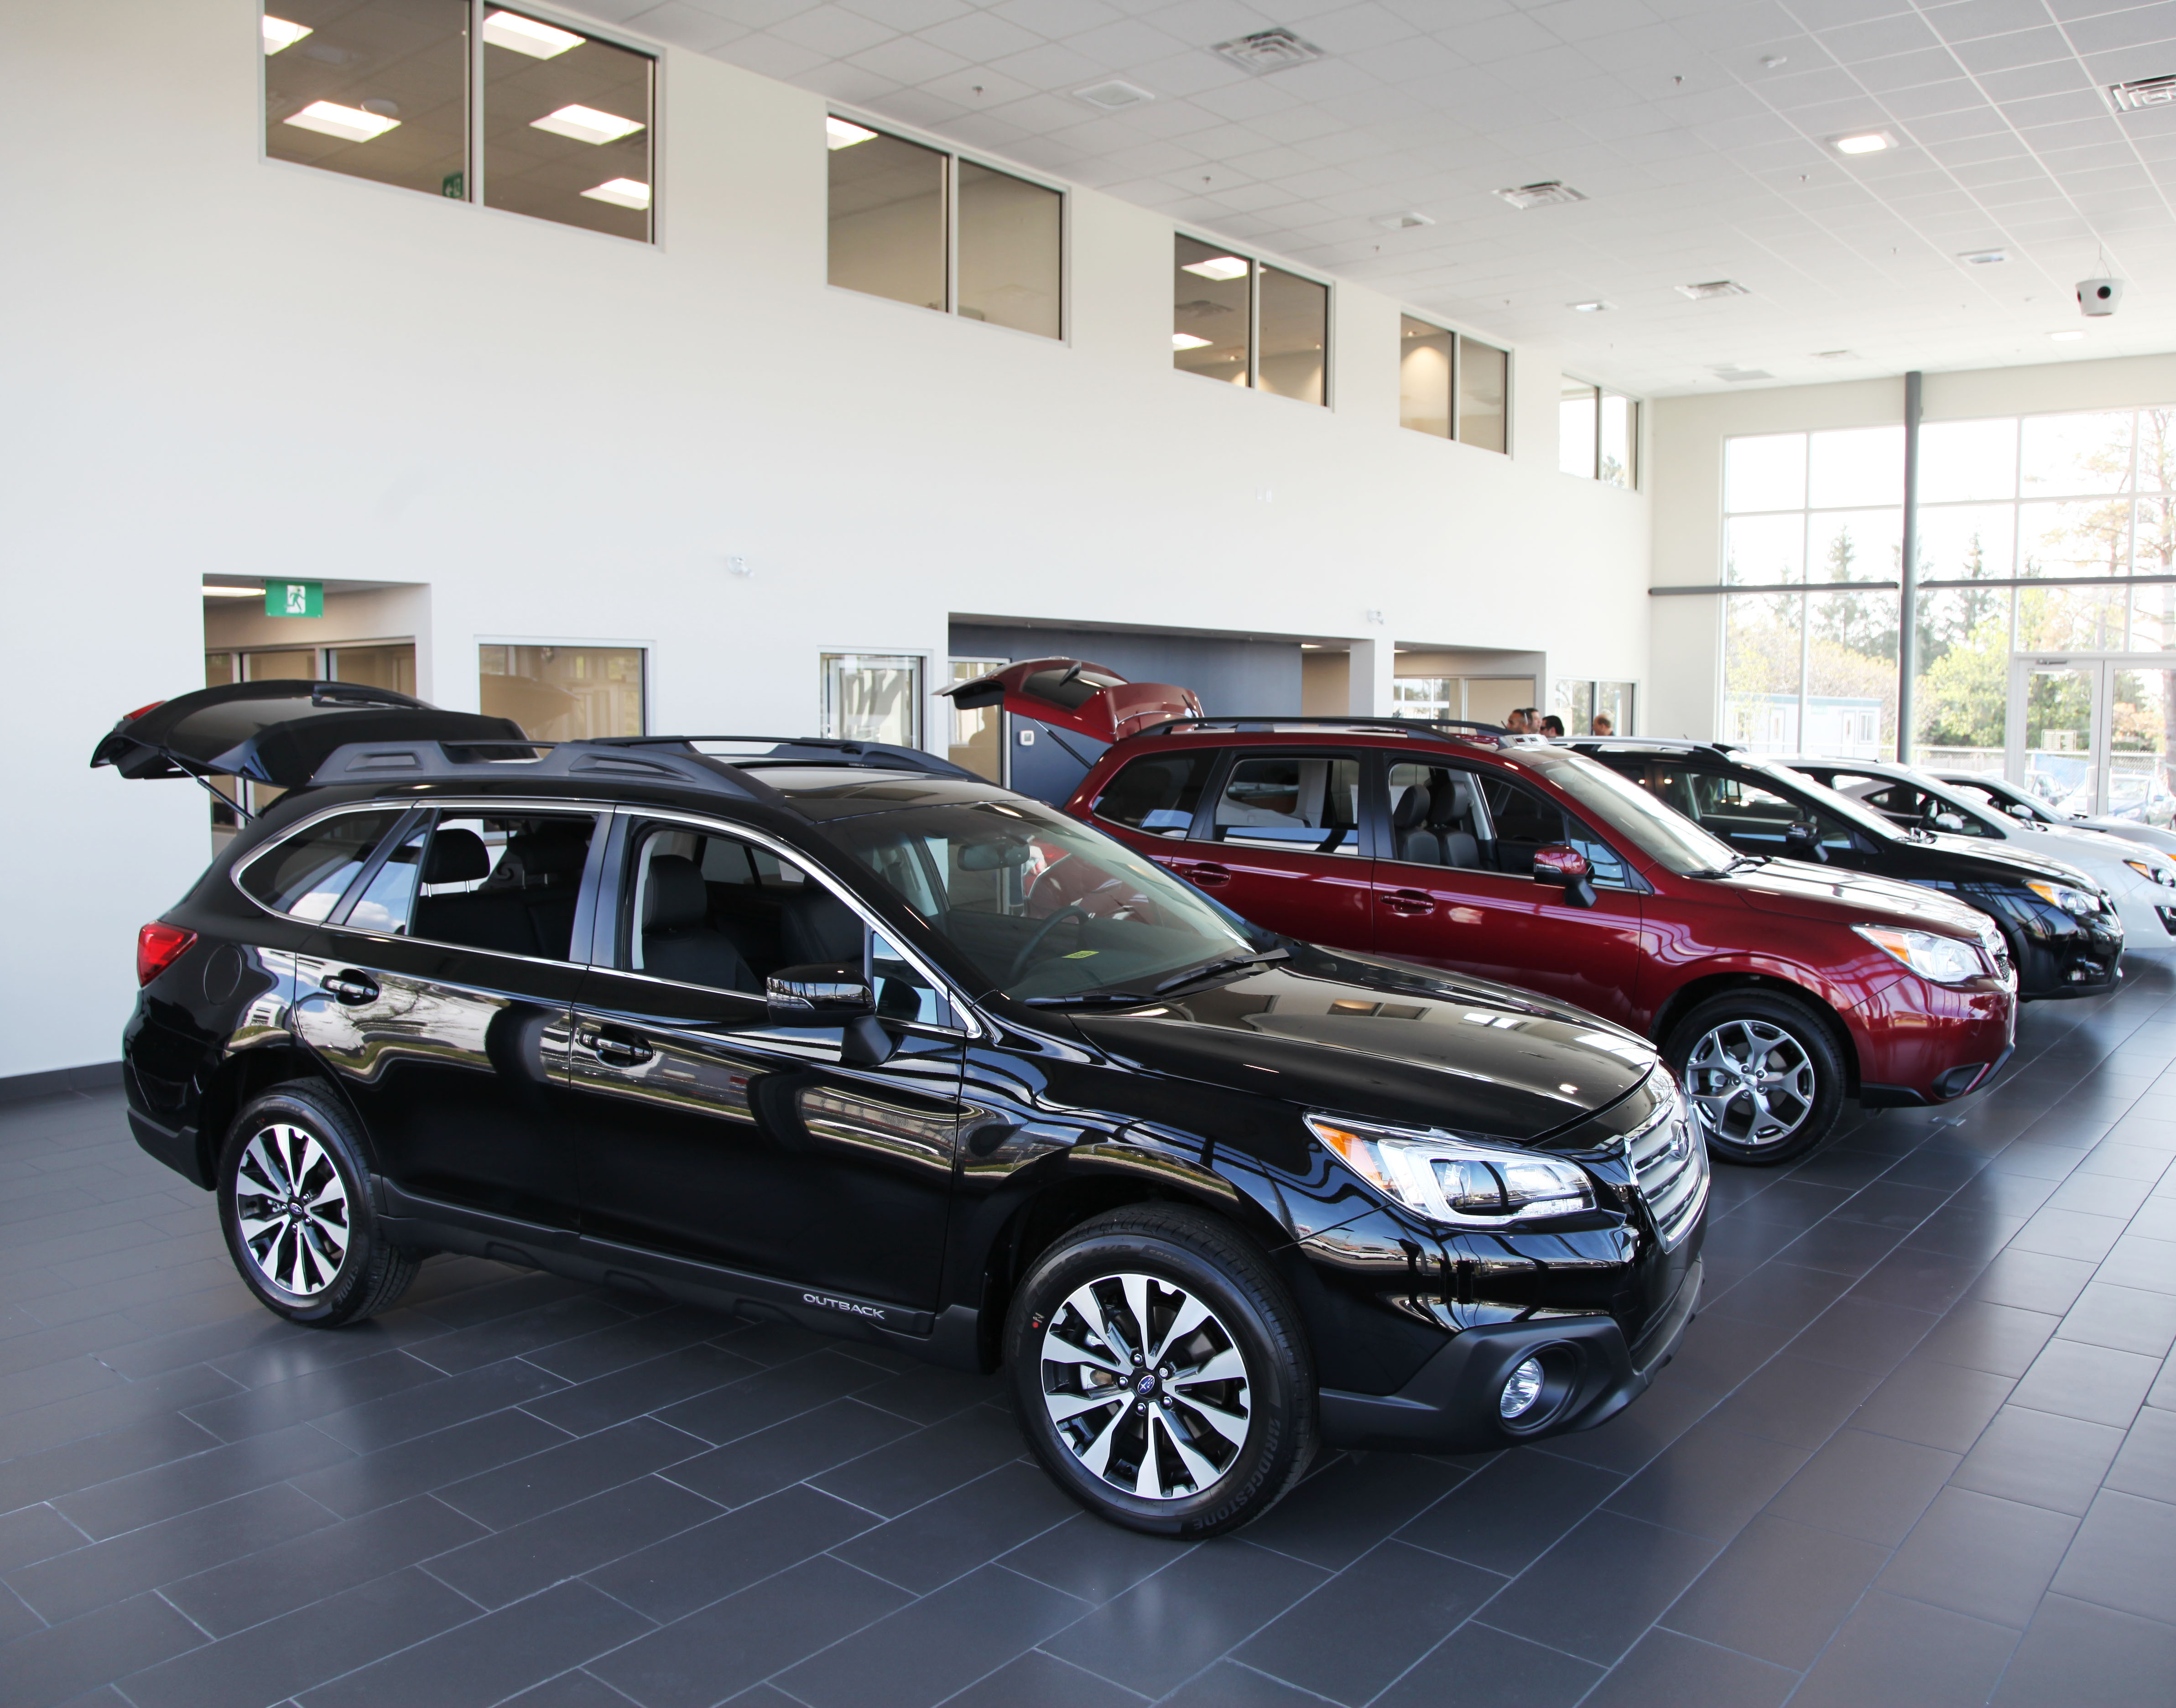 Subaru.opening2 - NewRoads